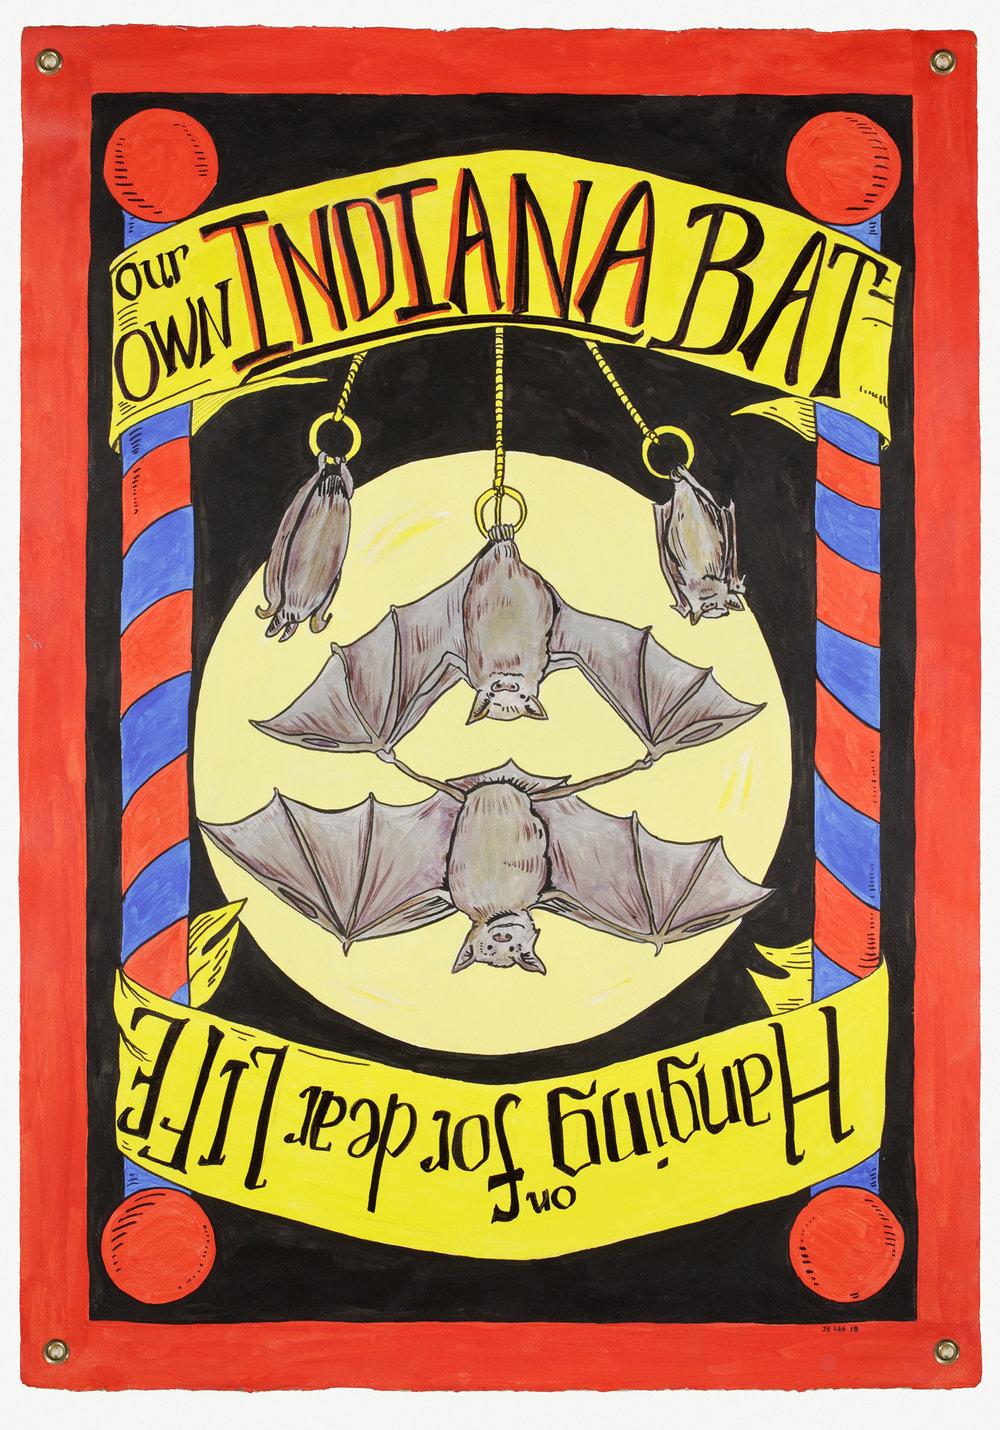 Indiana Bat copy.jpg